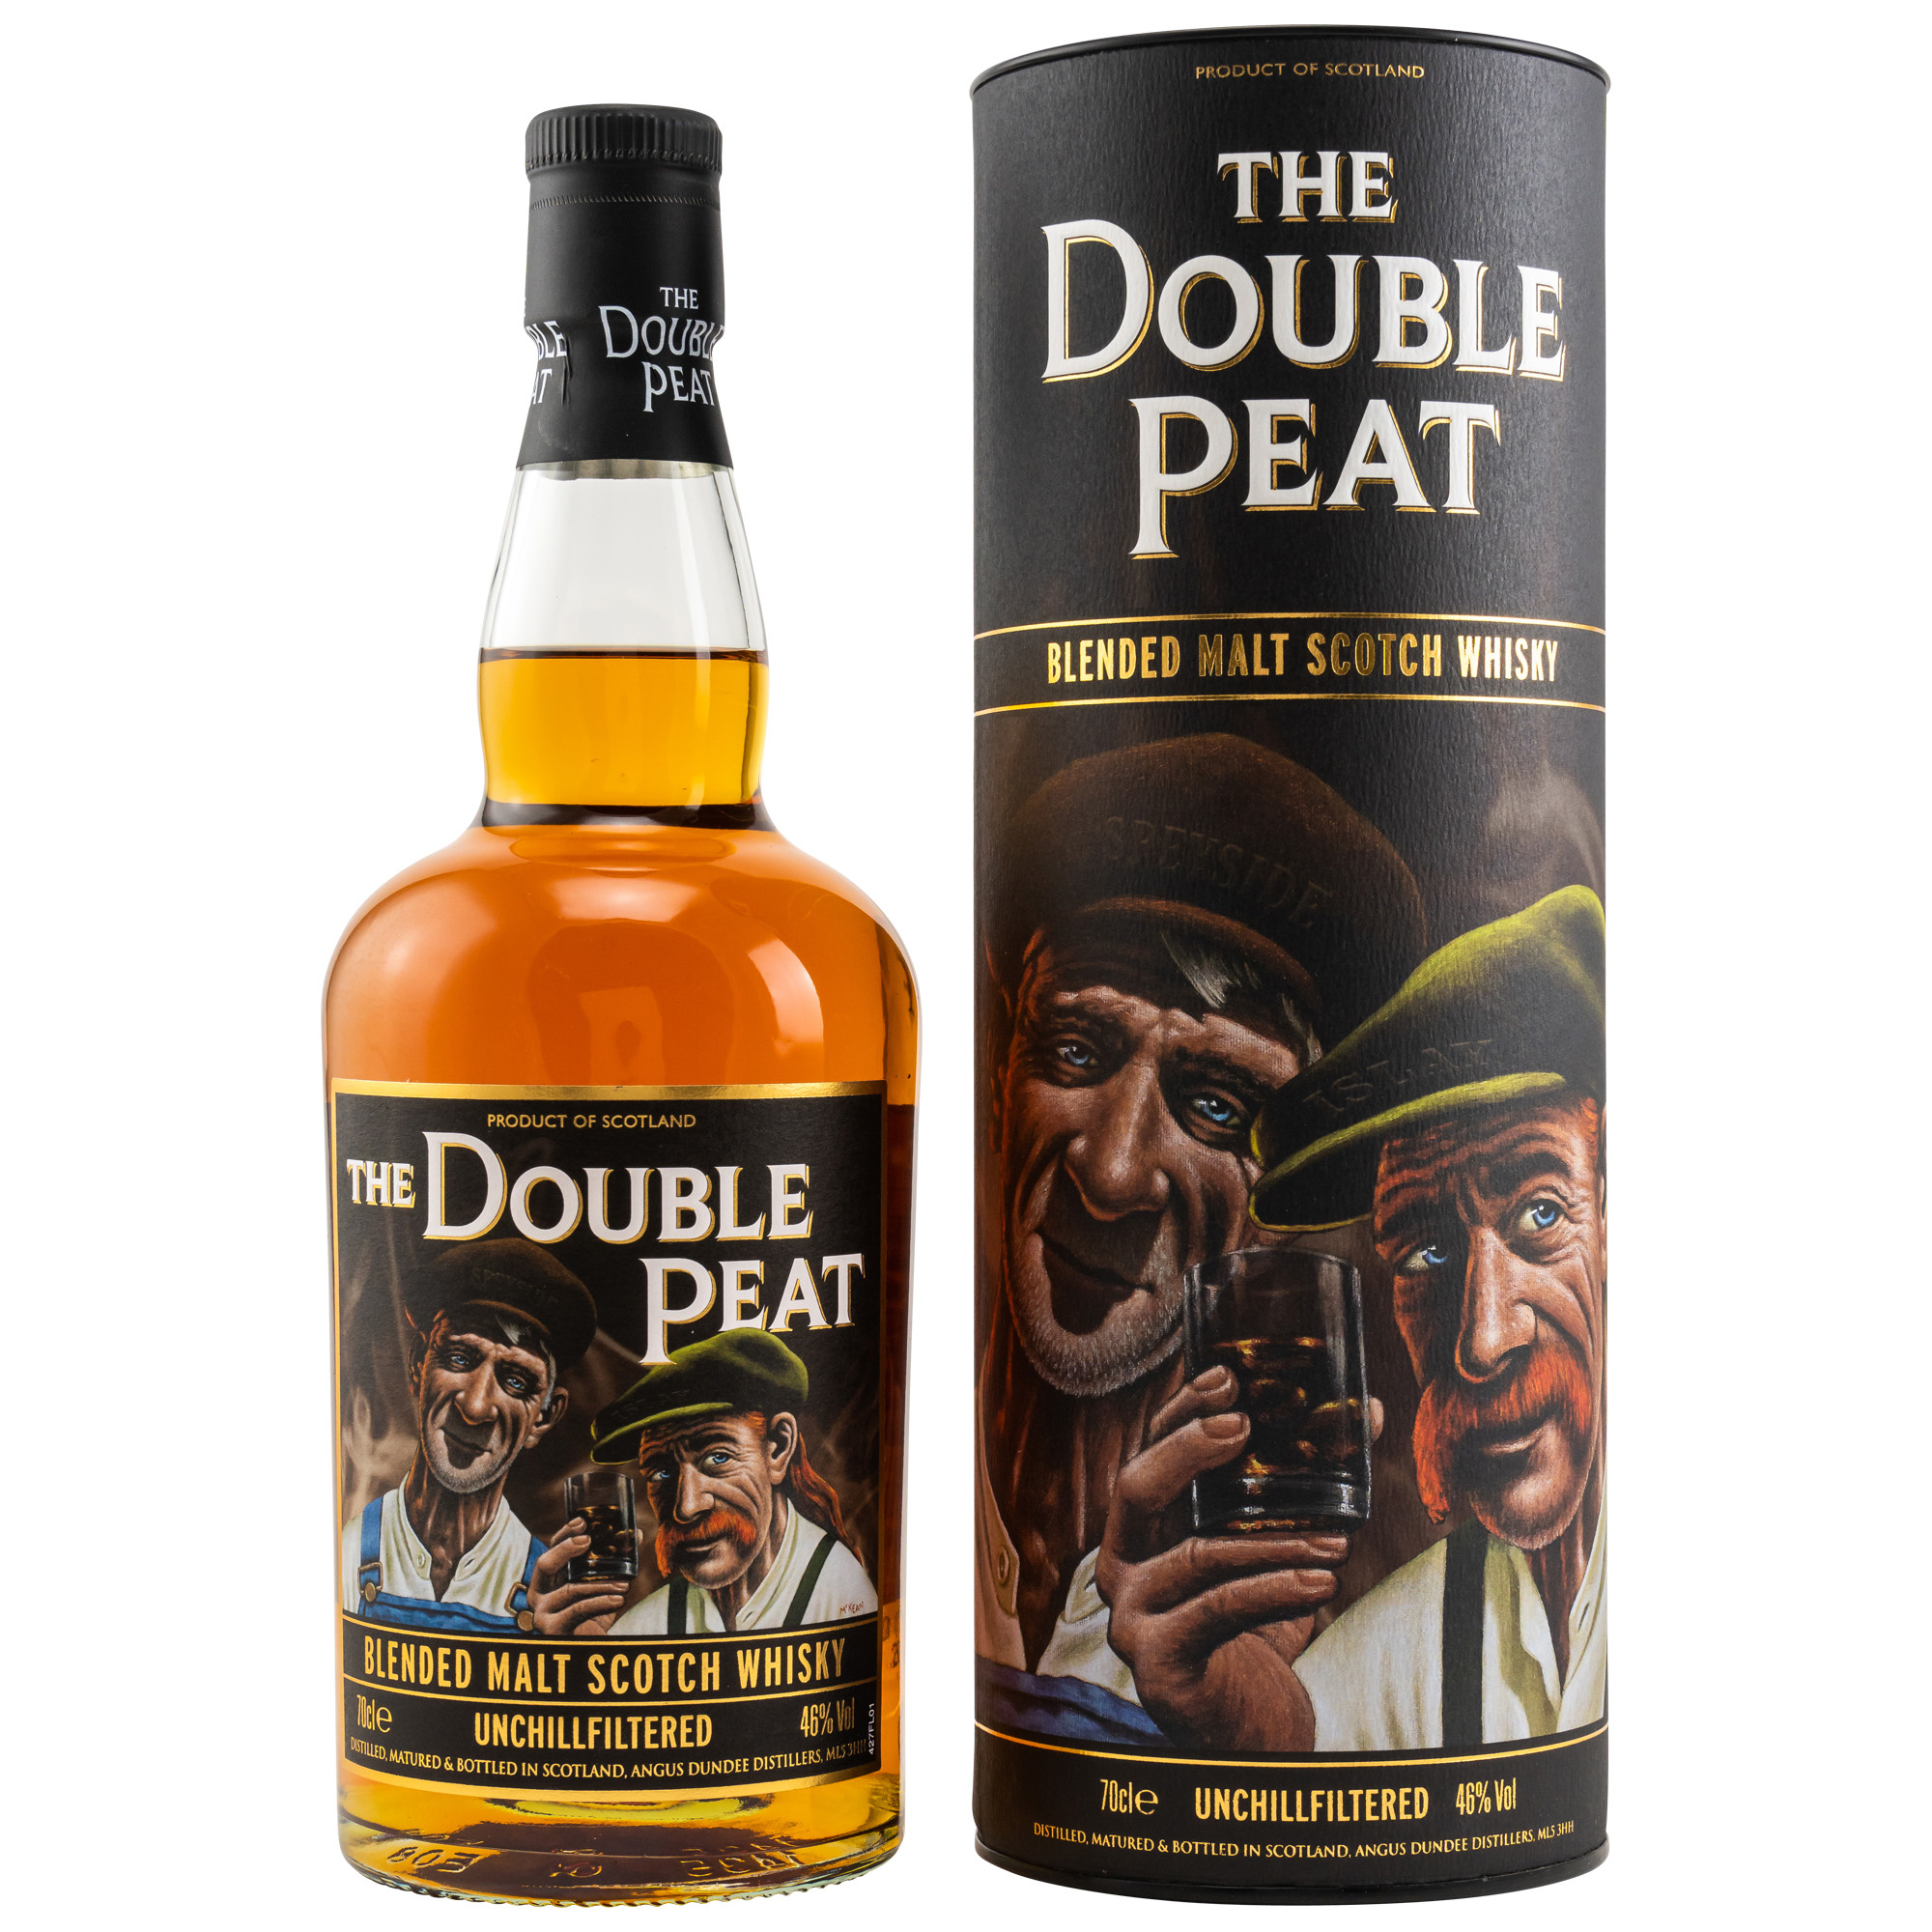 Rauchiger Preis-Leistungs-Tipp: The Double Peat